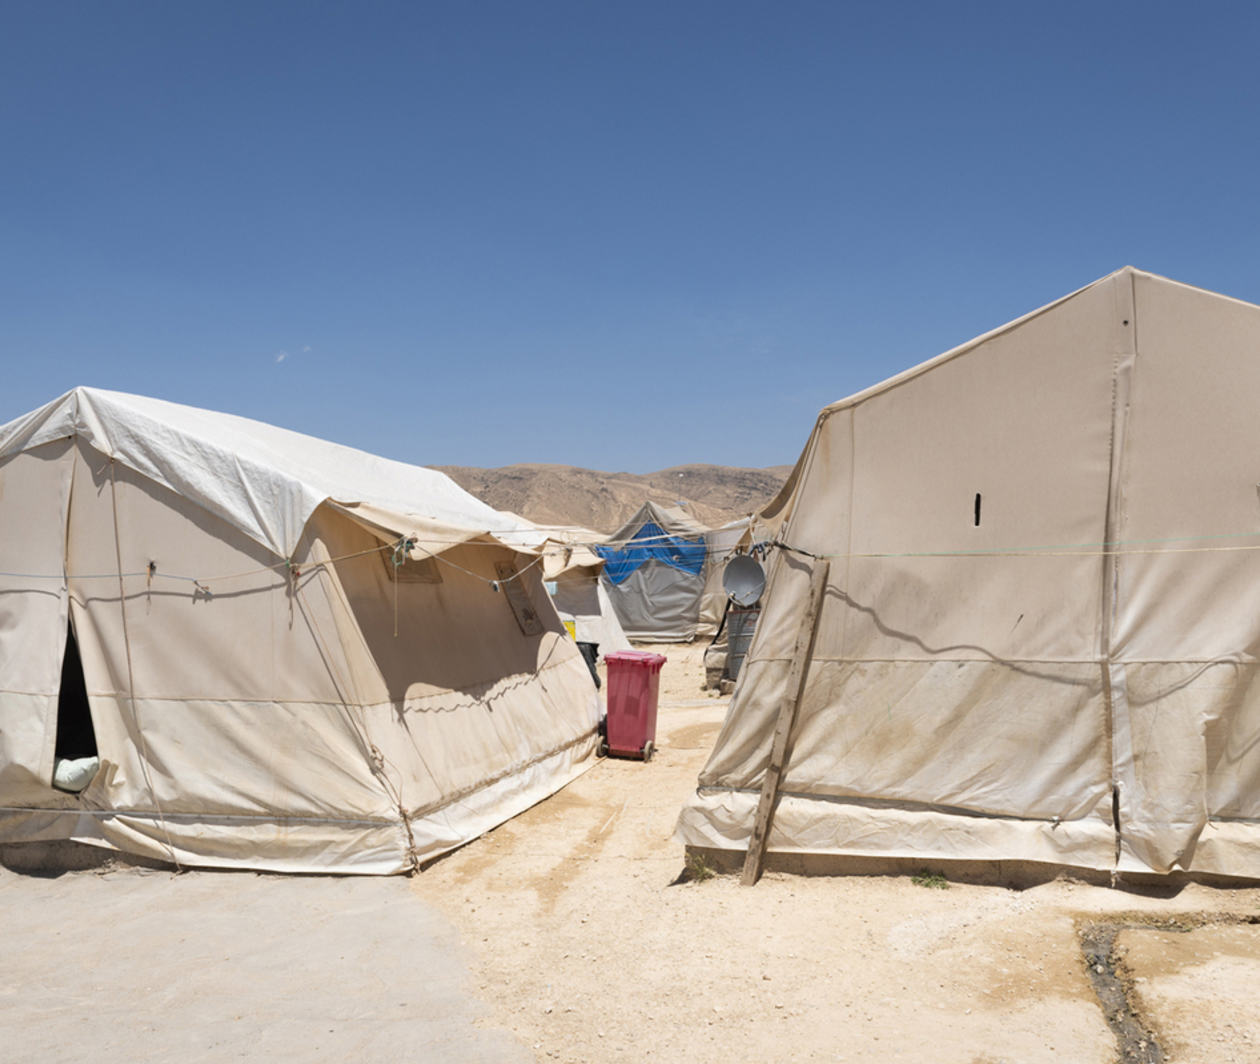 Introduction to Humanitarian Logistics